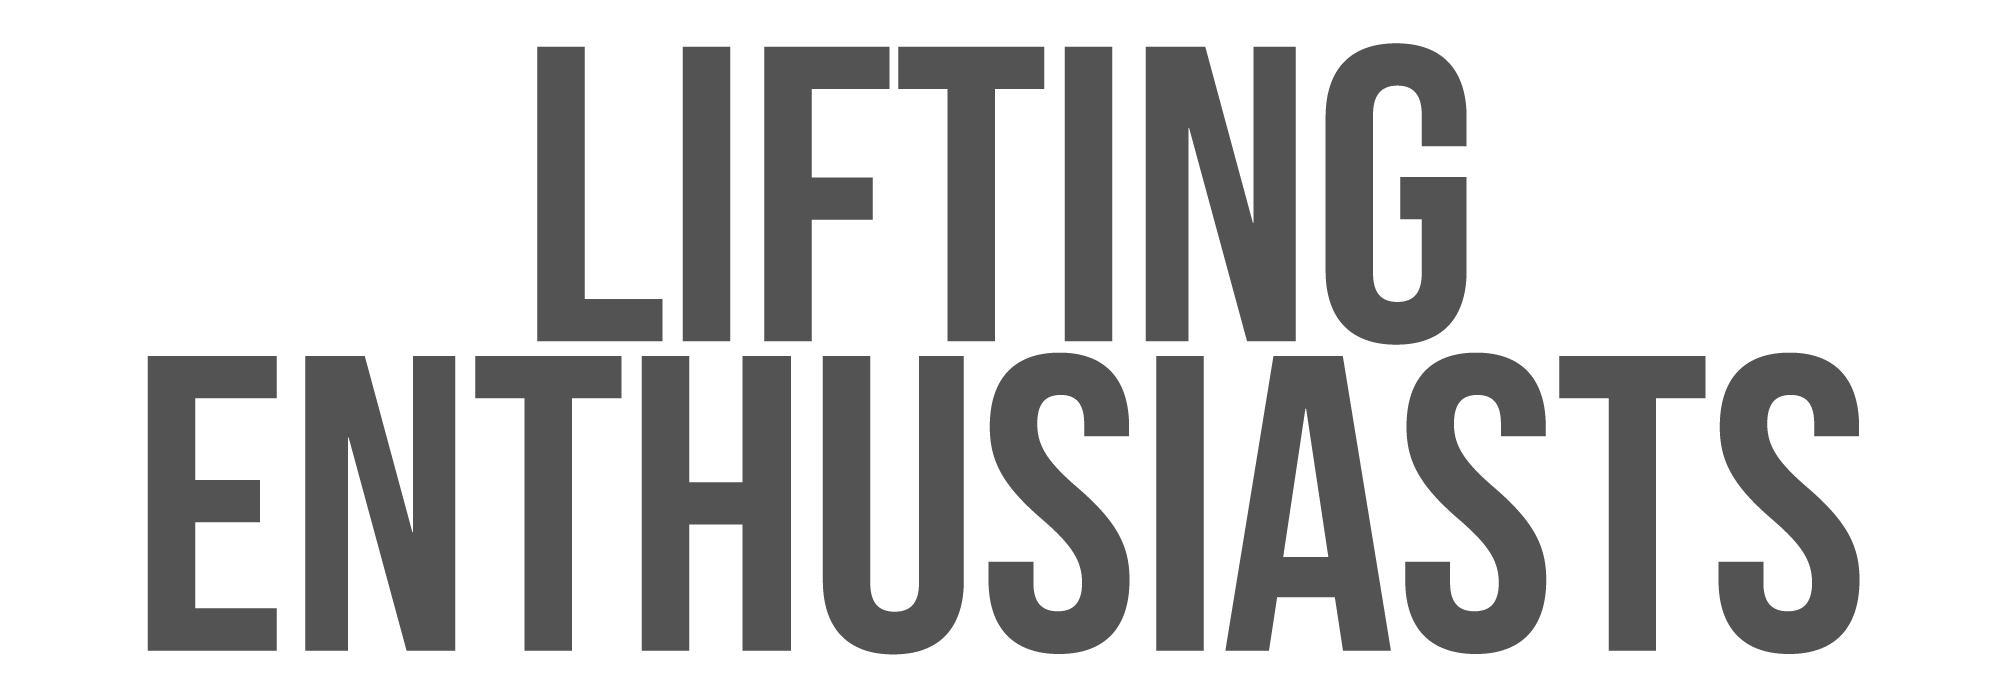 LIFTING ENTHUSIASTS